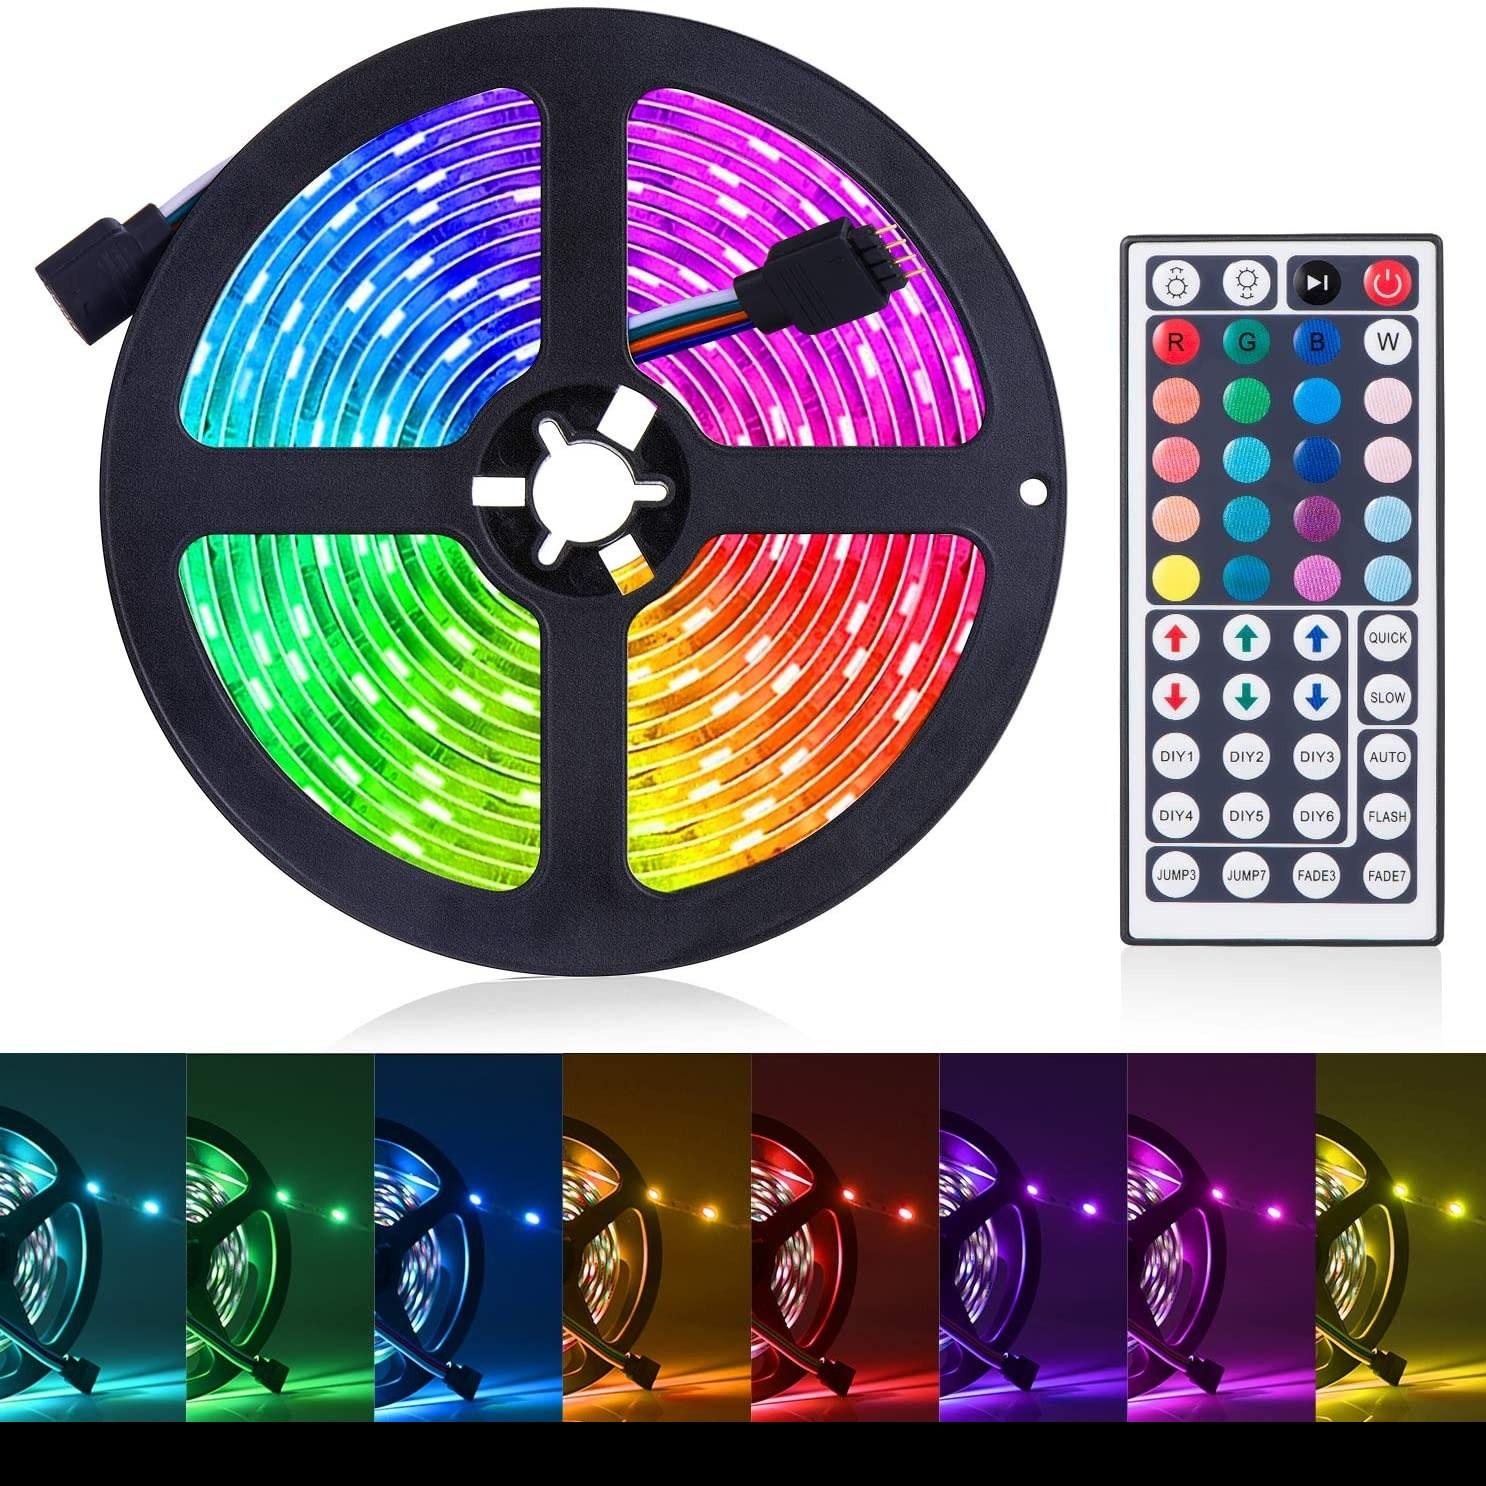 SUNNEST LED 스트립 조명 16.4f RGB 라이트 5050 테이프 홈 주방 침대 원격 로프 바 카 장식